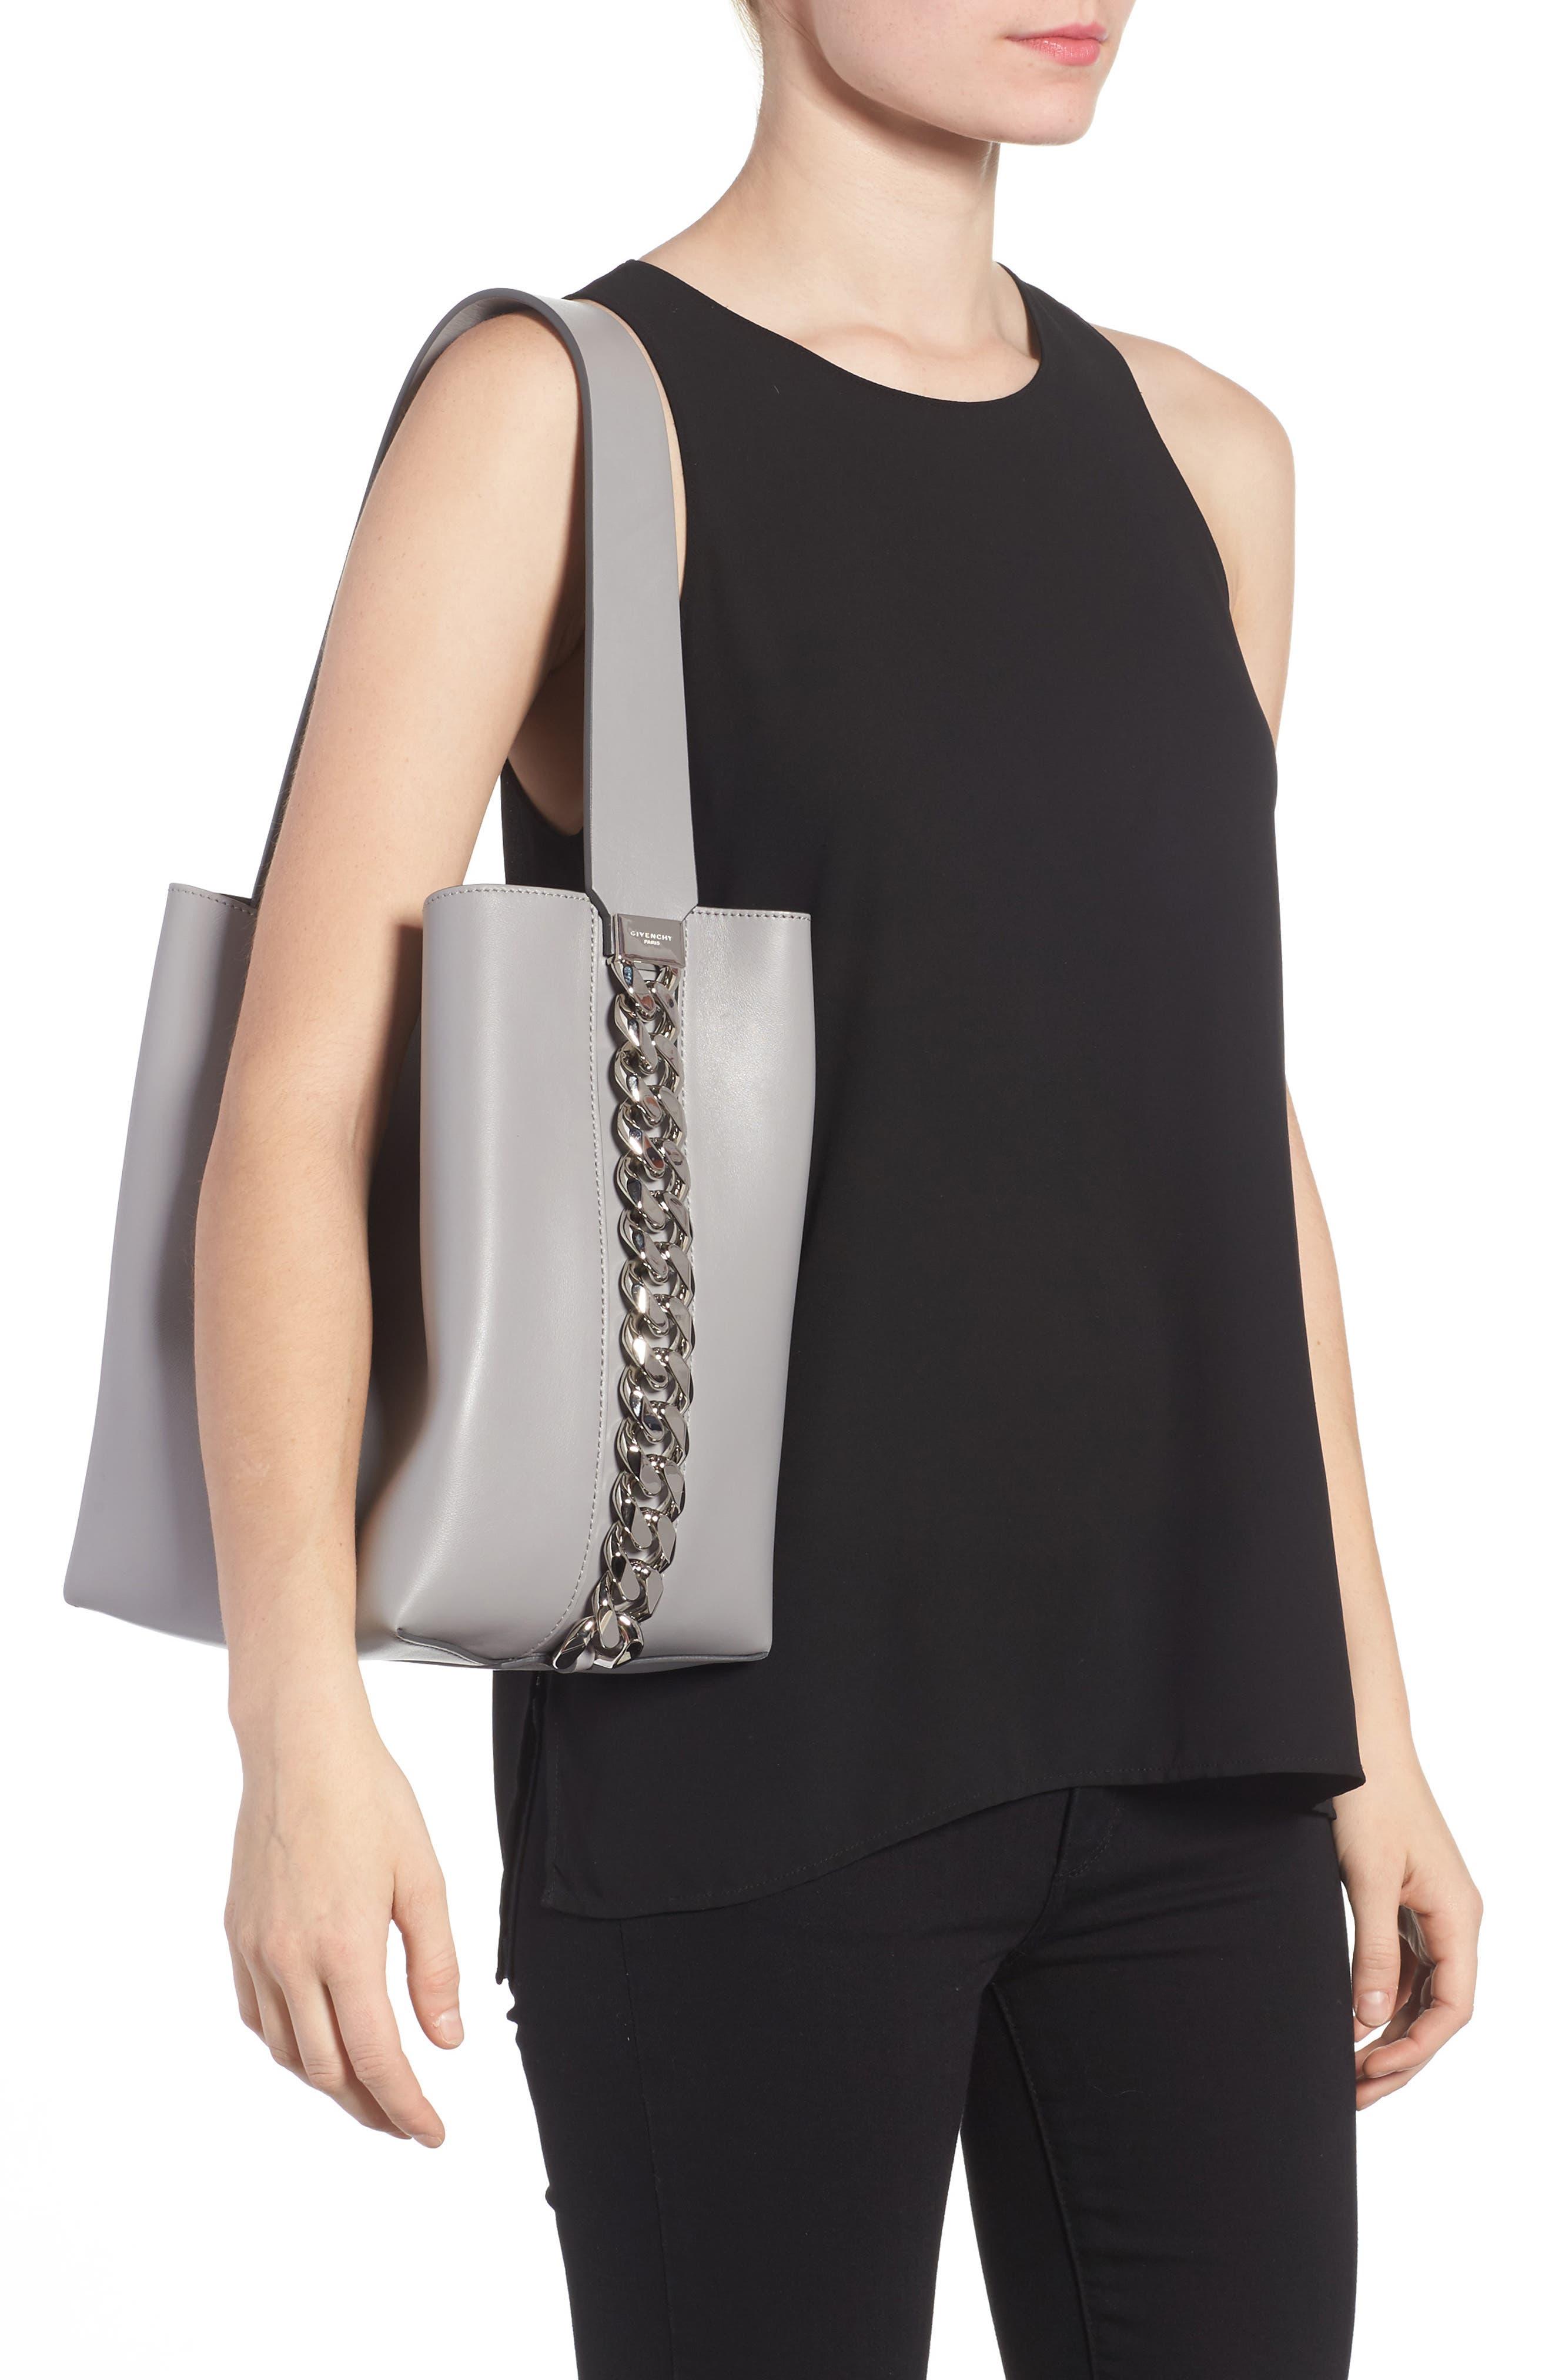 Infinity Calfskin Leather Bucket Bag,                             Alternate thumbnail 2, color,                             051